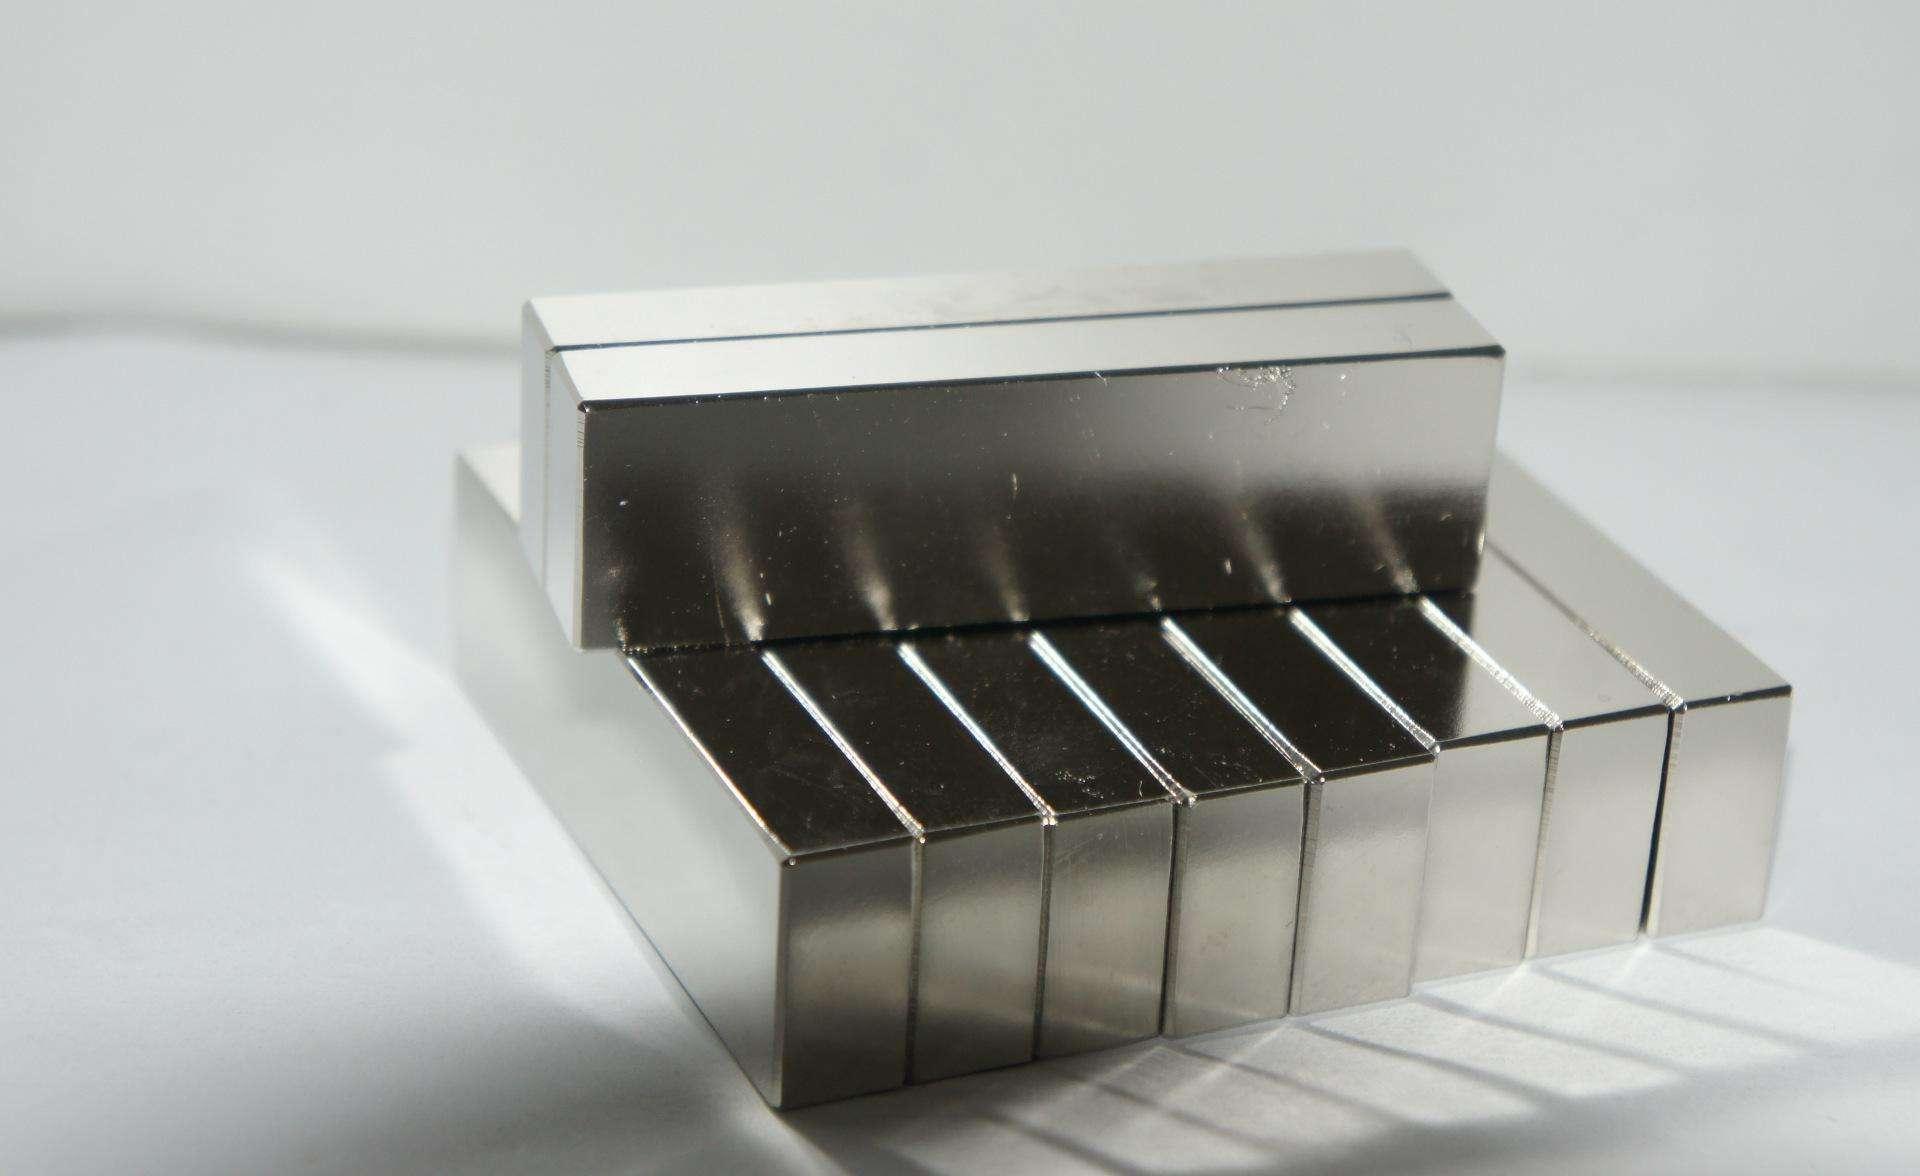 Magnetics large rare earth n52 neodymium magnet powerful Block NdFeB